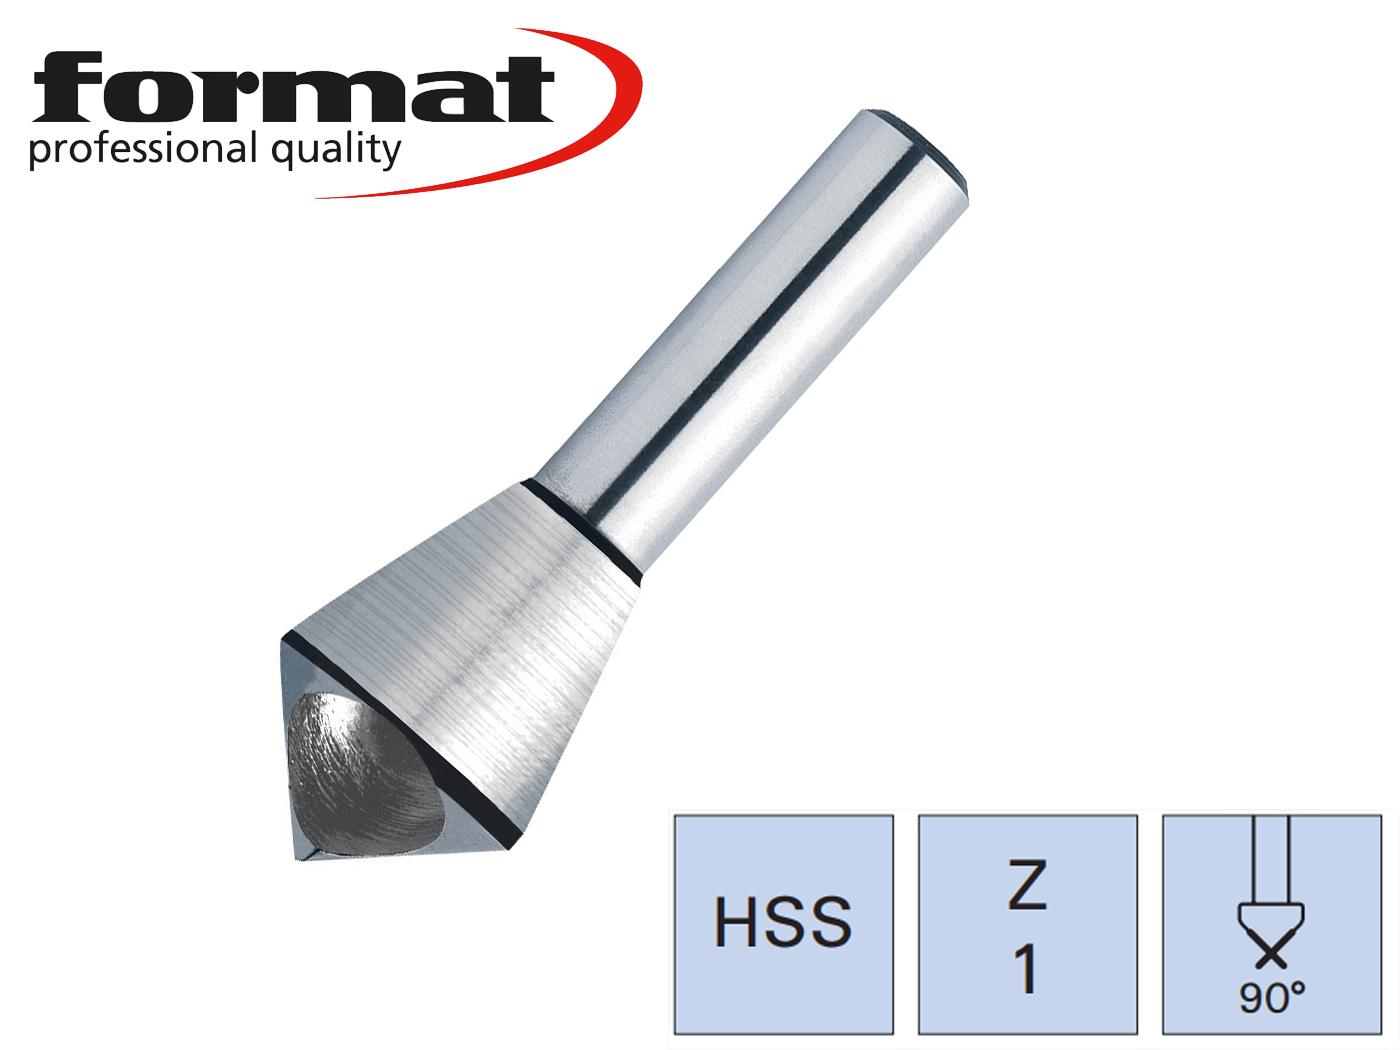 verzinkboren QL HSS 90G FORMAT | DKMTools - DKM Tools